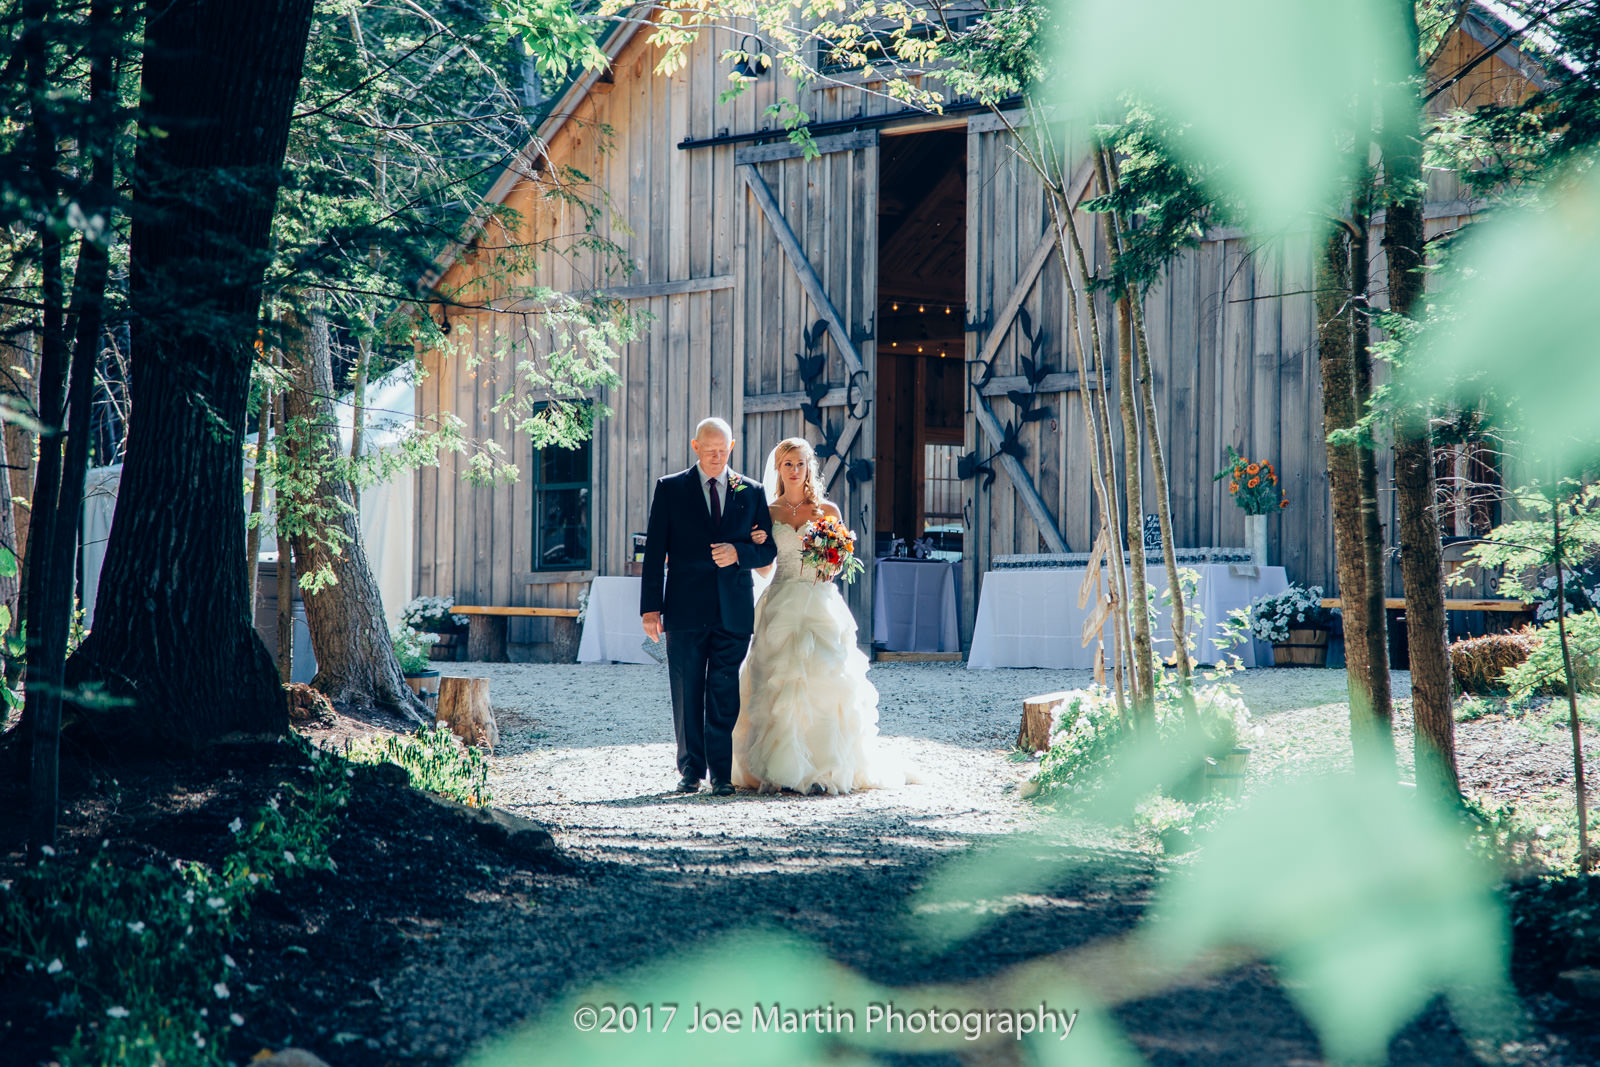 Joe loehnis wedding